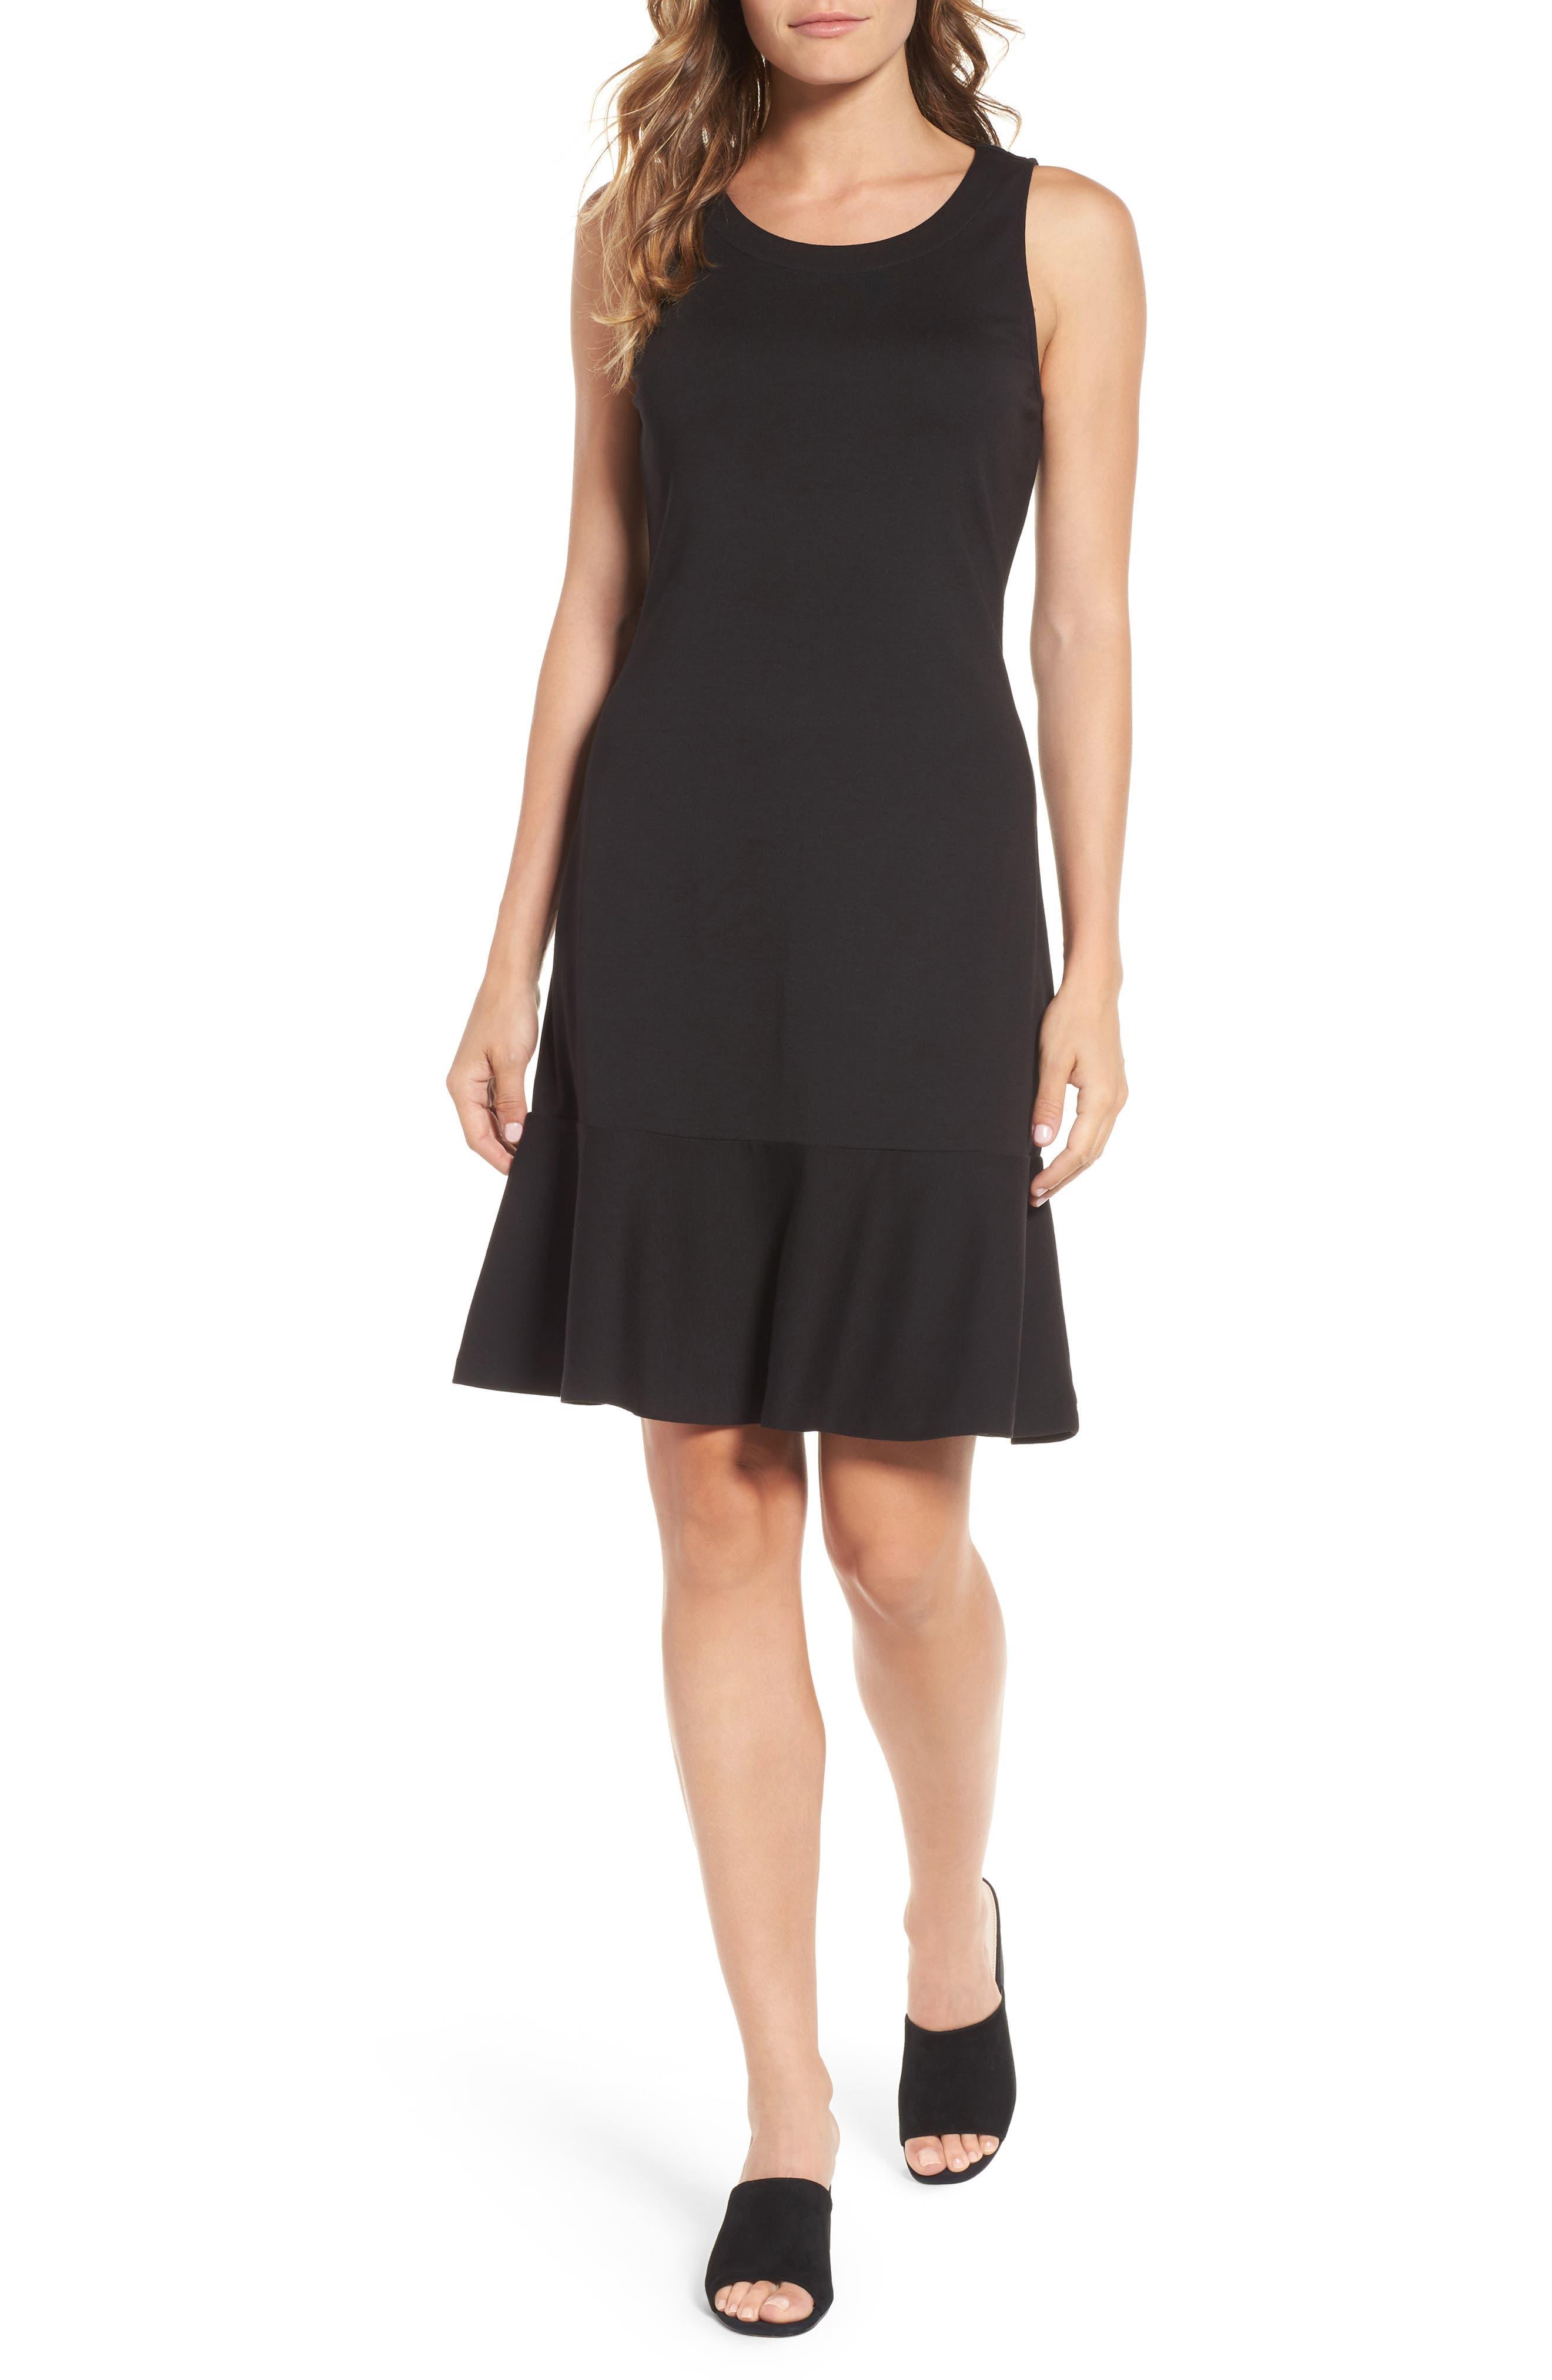 Alternate Image 1 Selected - Tommy Bahama Ponte Knit A-Line Dress